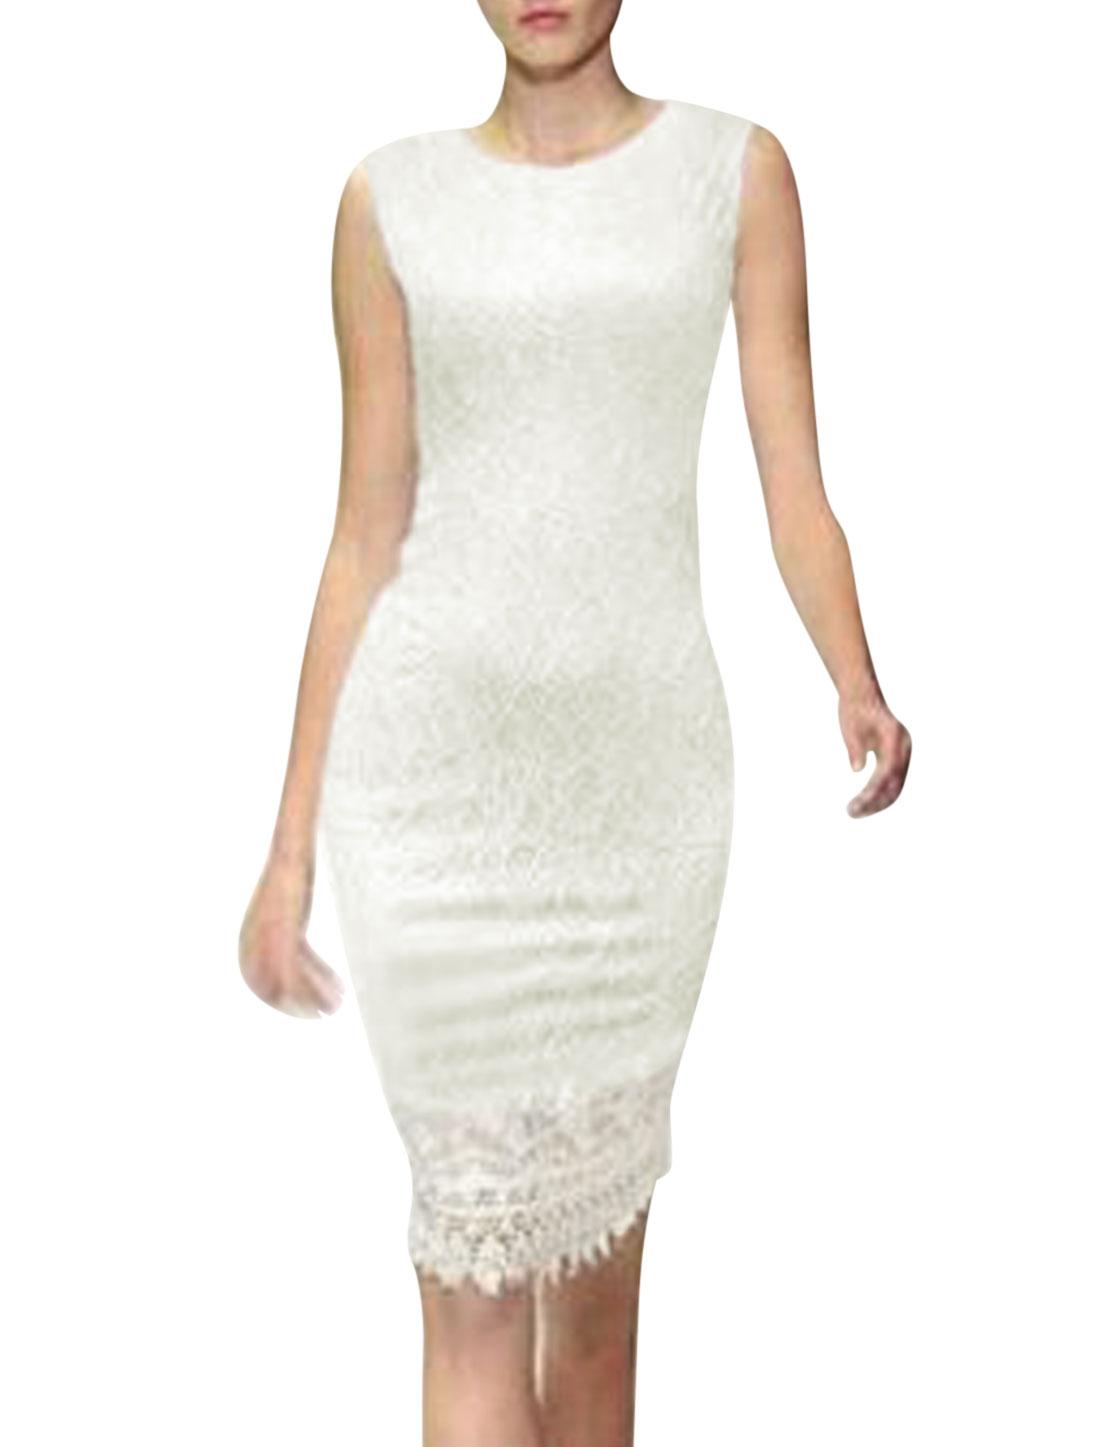 Women Round Neck Sleeveless Full Lined Lace Mini Dress White S